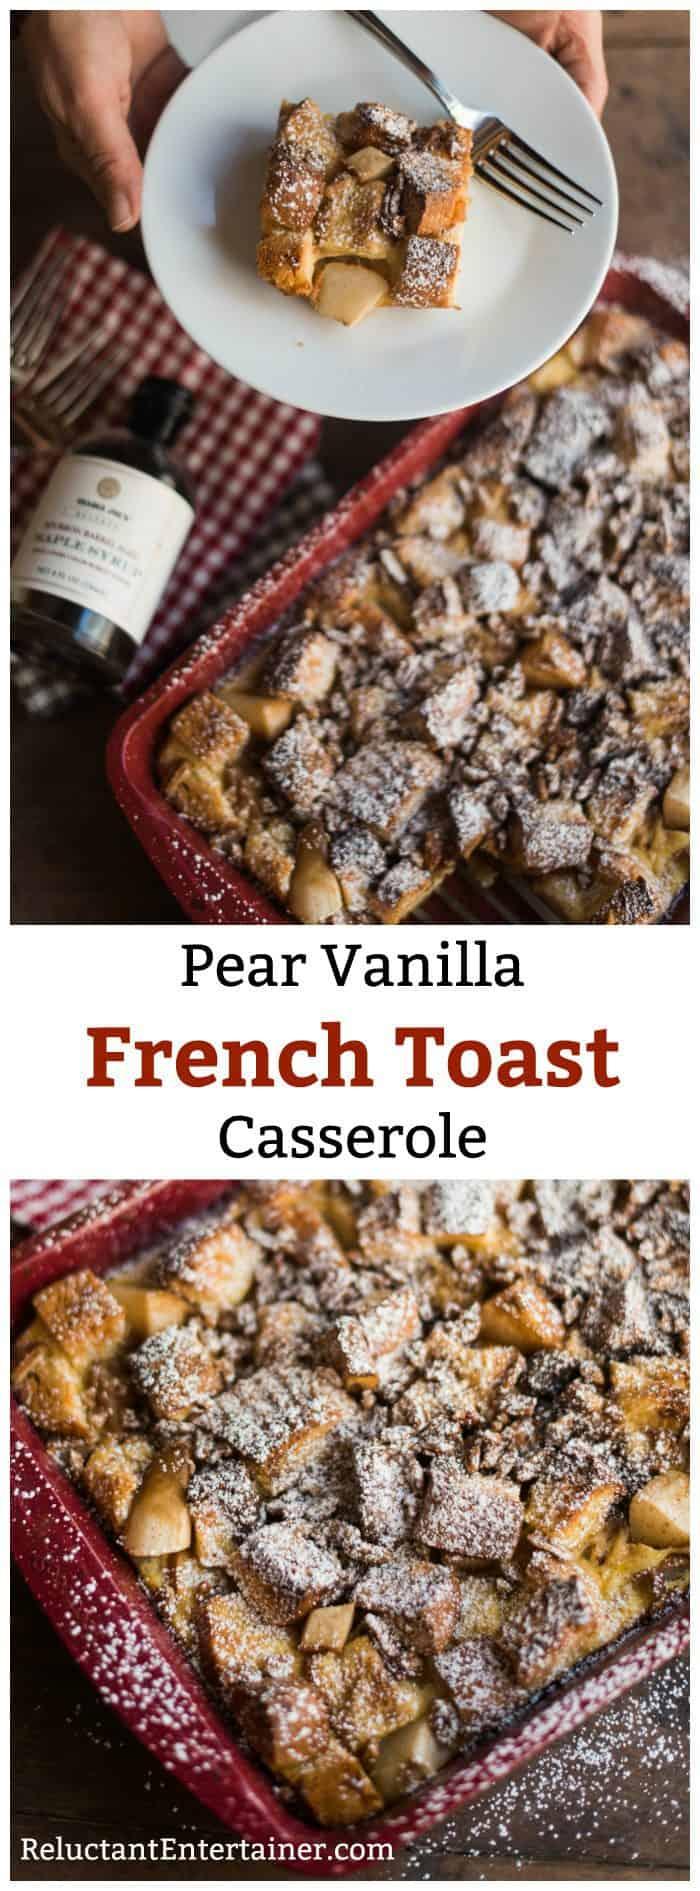 Pear Vanilla French Toast Casserole